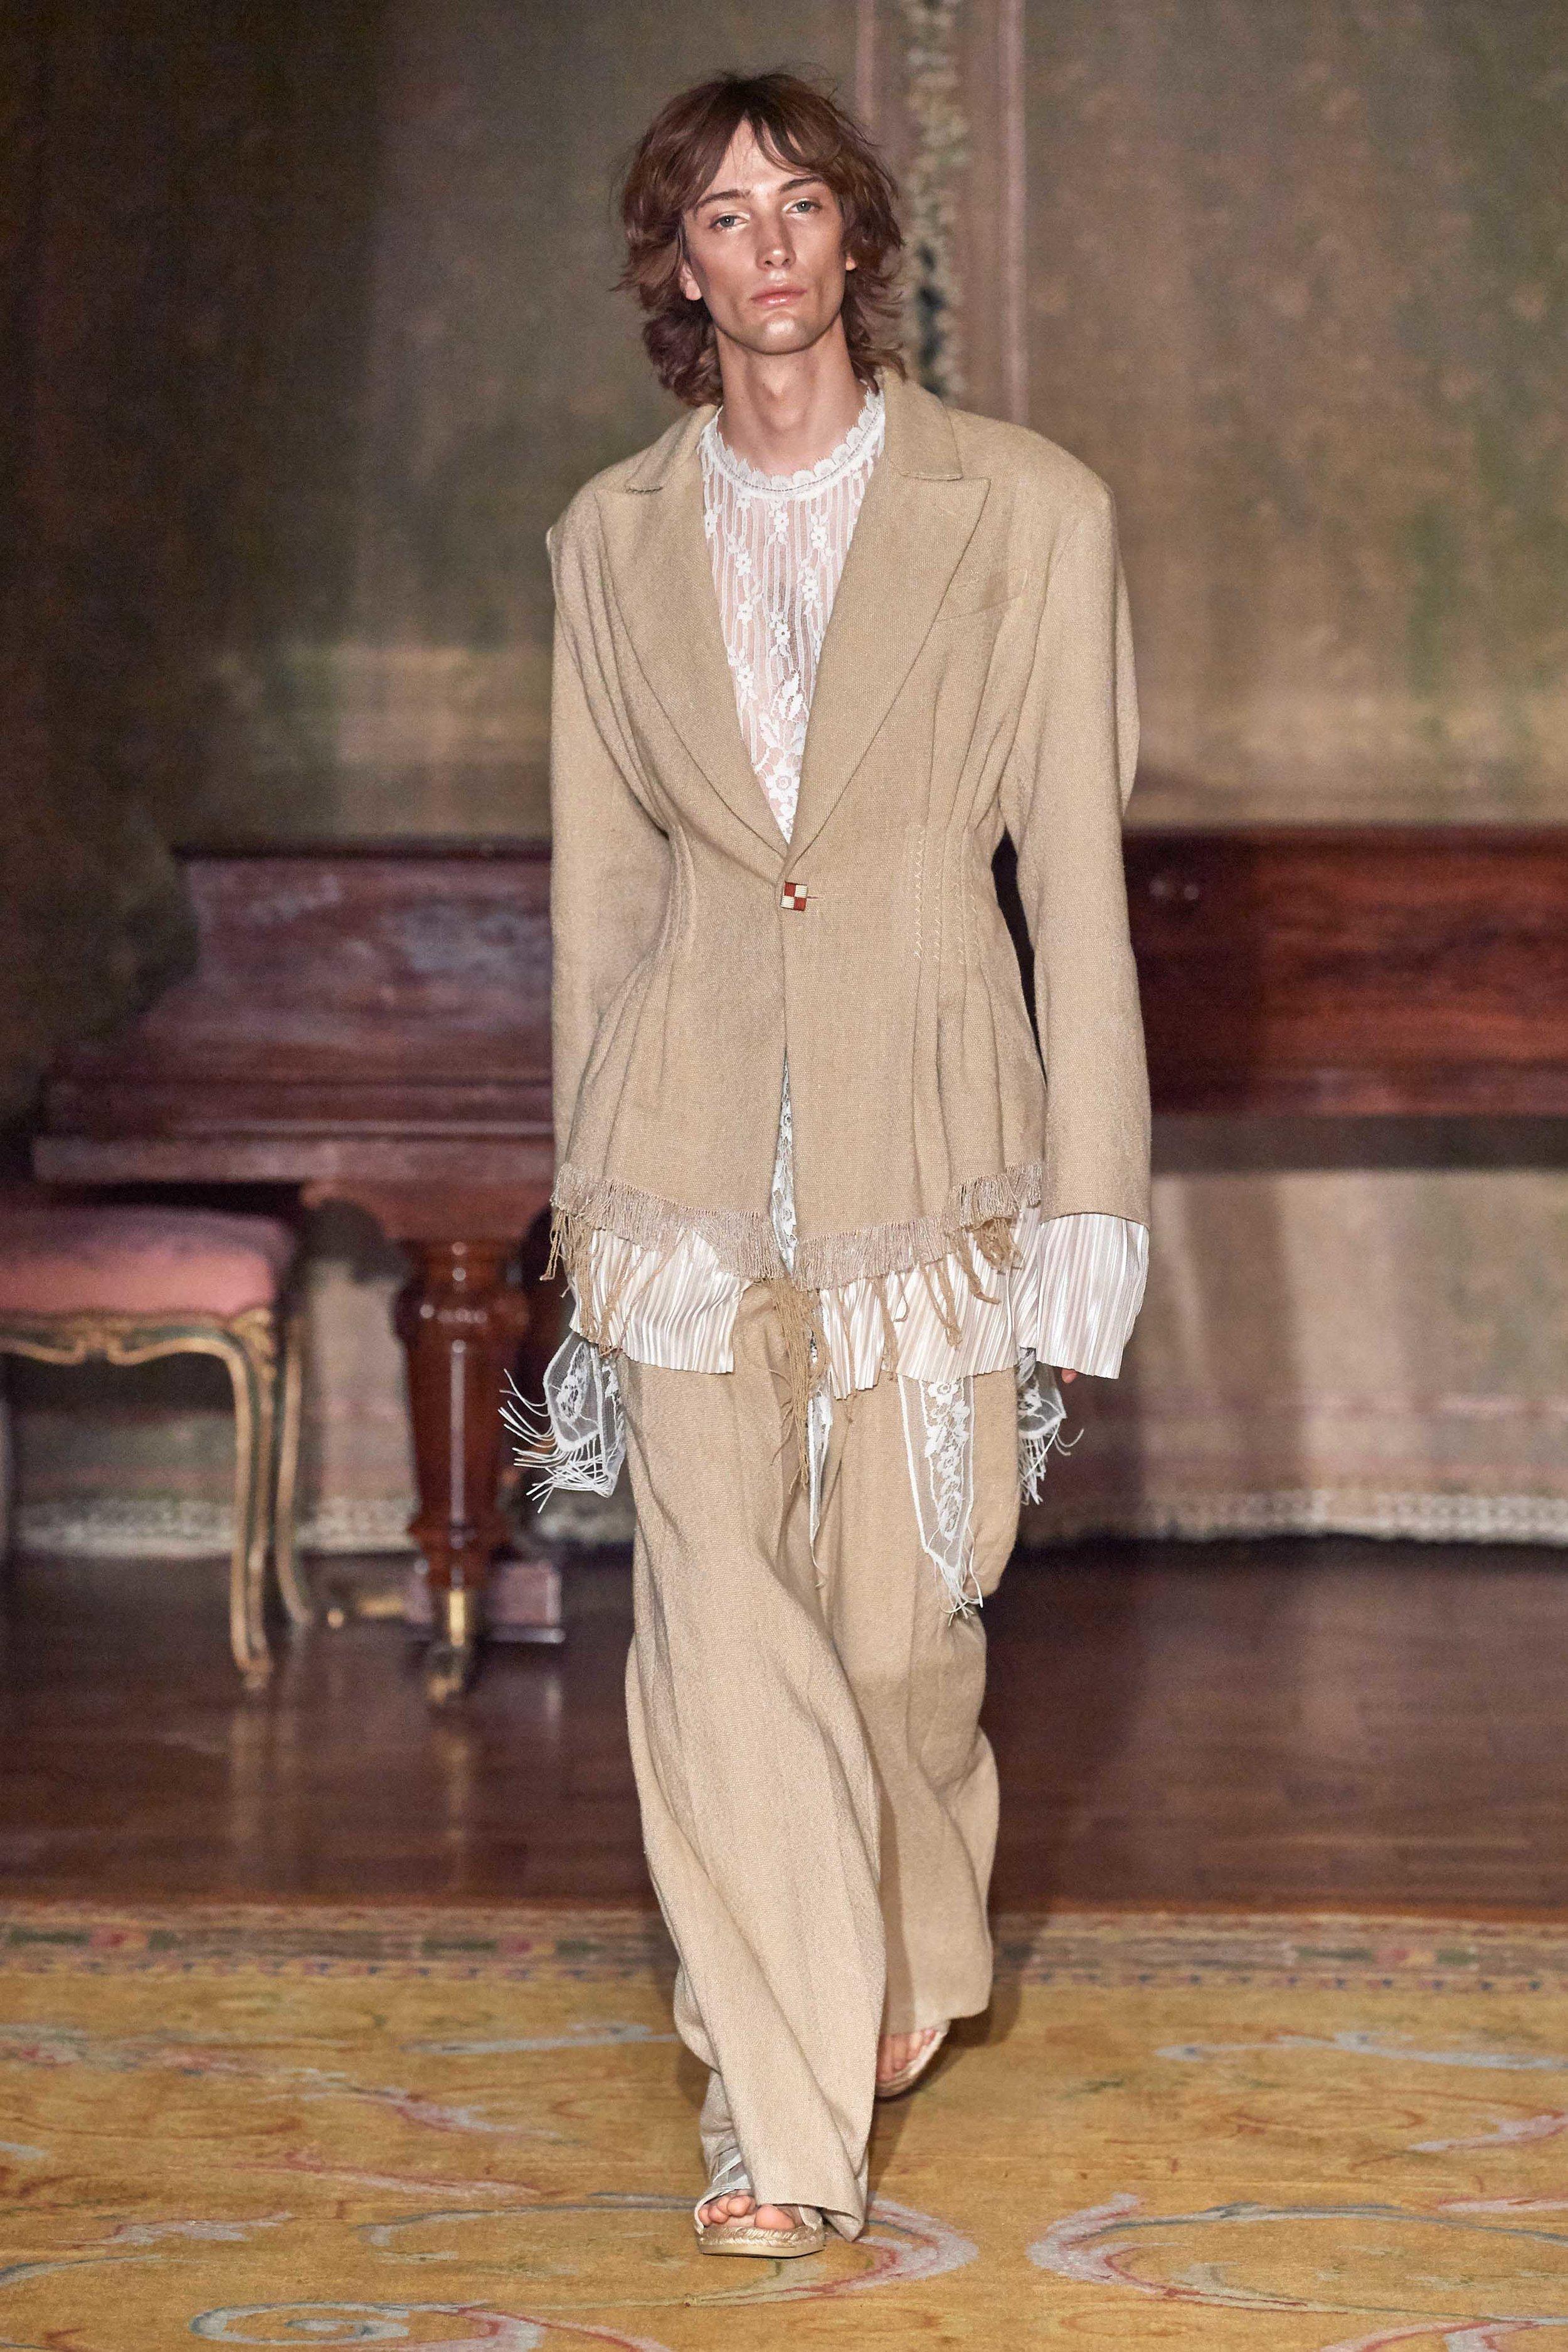 palomo-spain-2020-milan-fashion-casper-.jpg